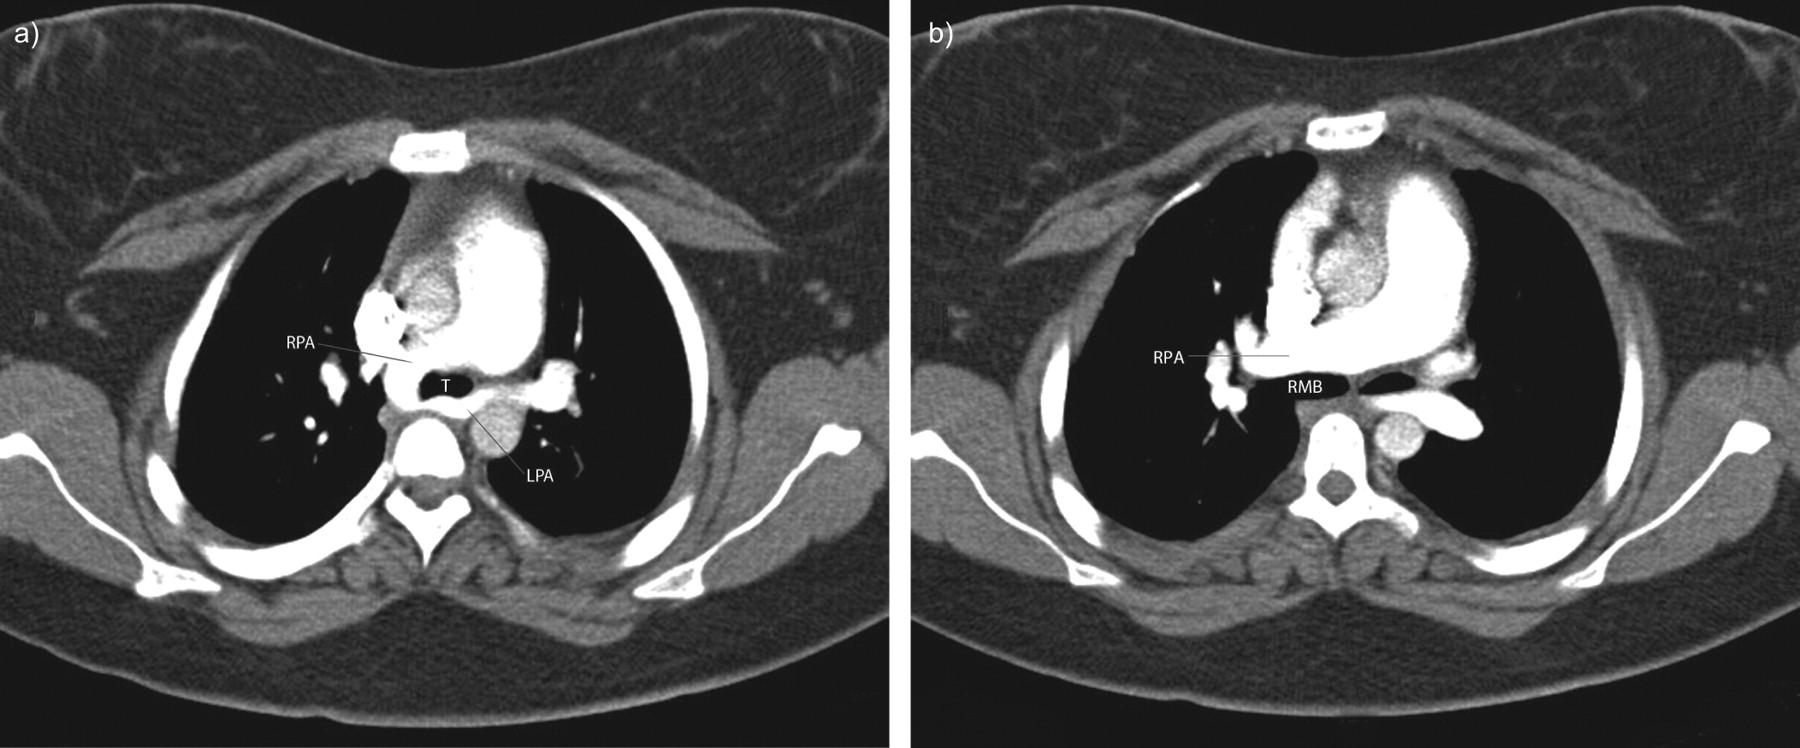 Congenital Rubella Syndrome And Left Pulmonary Artery Sling